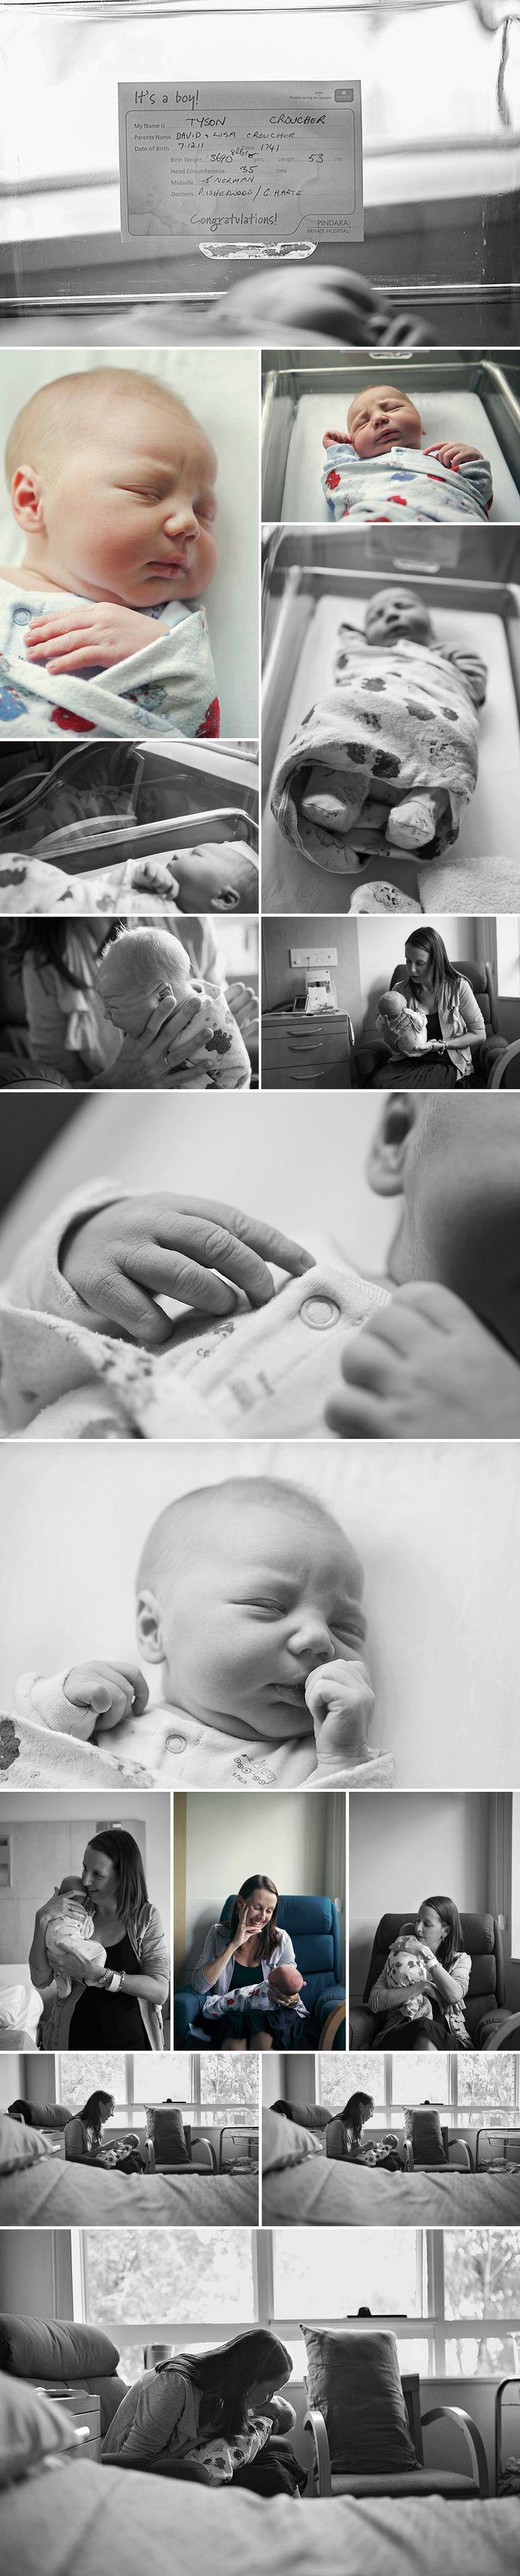 Hospital Session: Photography Newborn, Newborn Session, Newborn Photo, Hospital Newborn, Hospital Photo, Newborn Hospital, Baby Photo